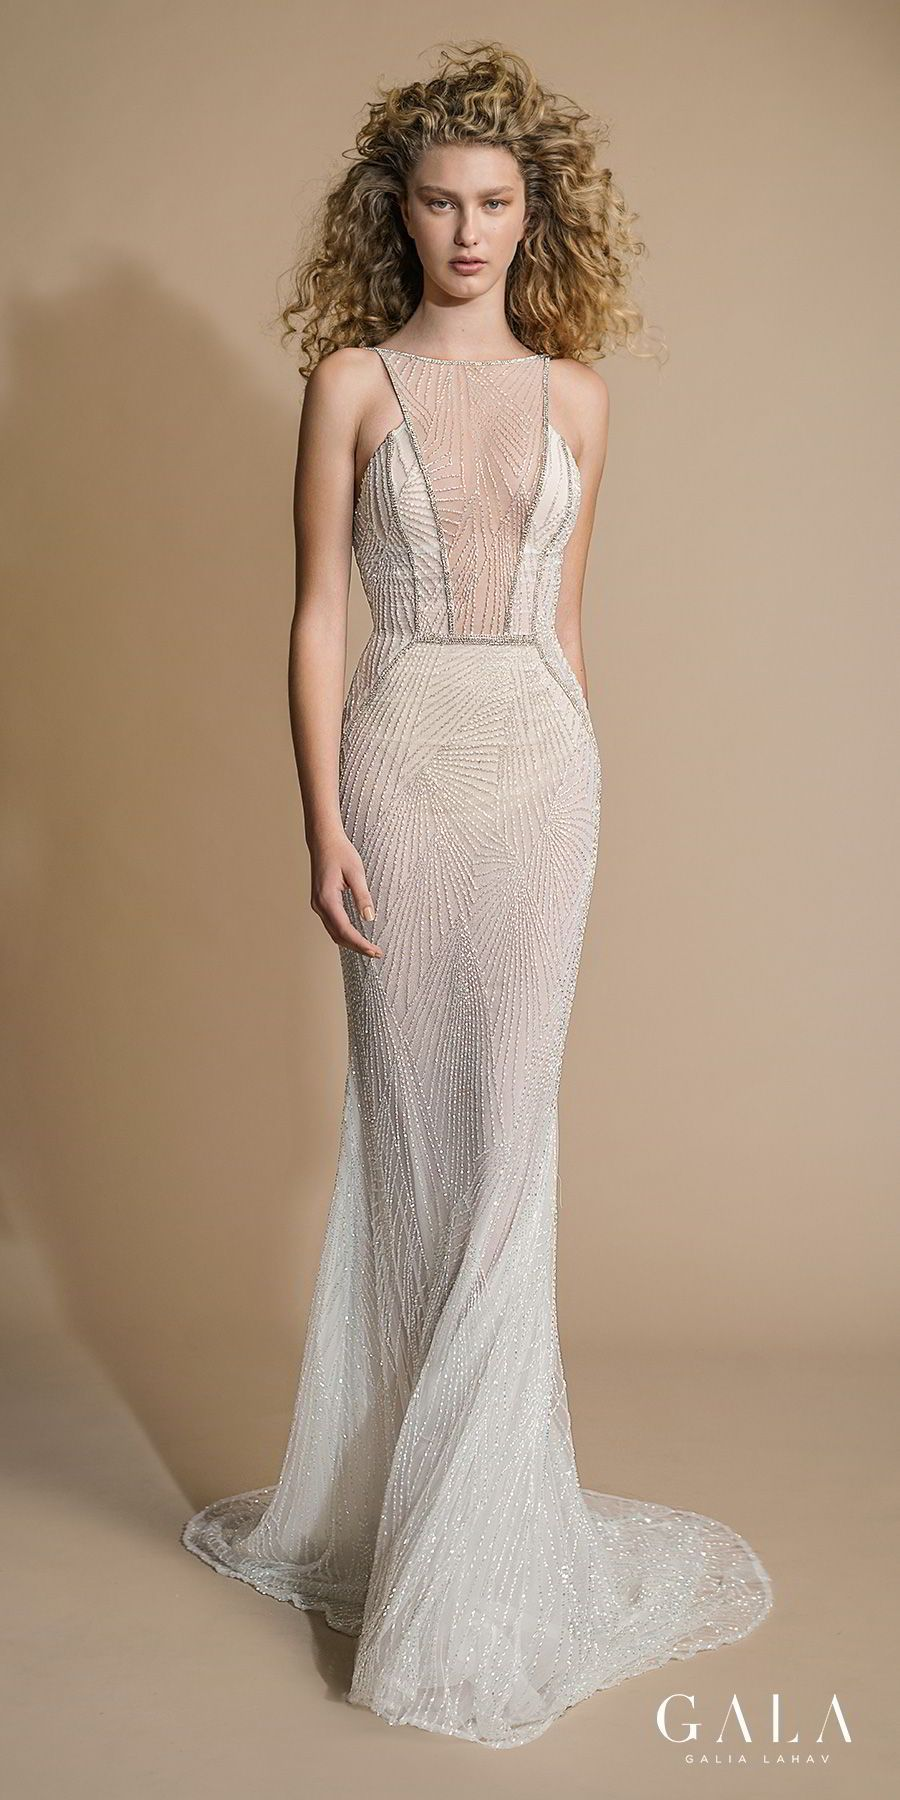 GALA by Galia Lahav Collection No. VI — These Wedding Dresses are ...